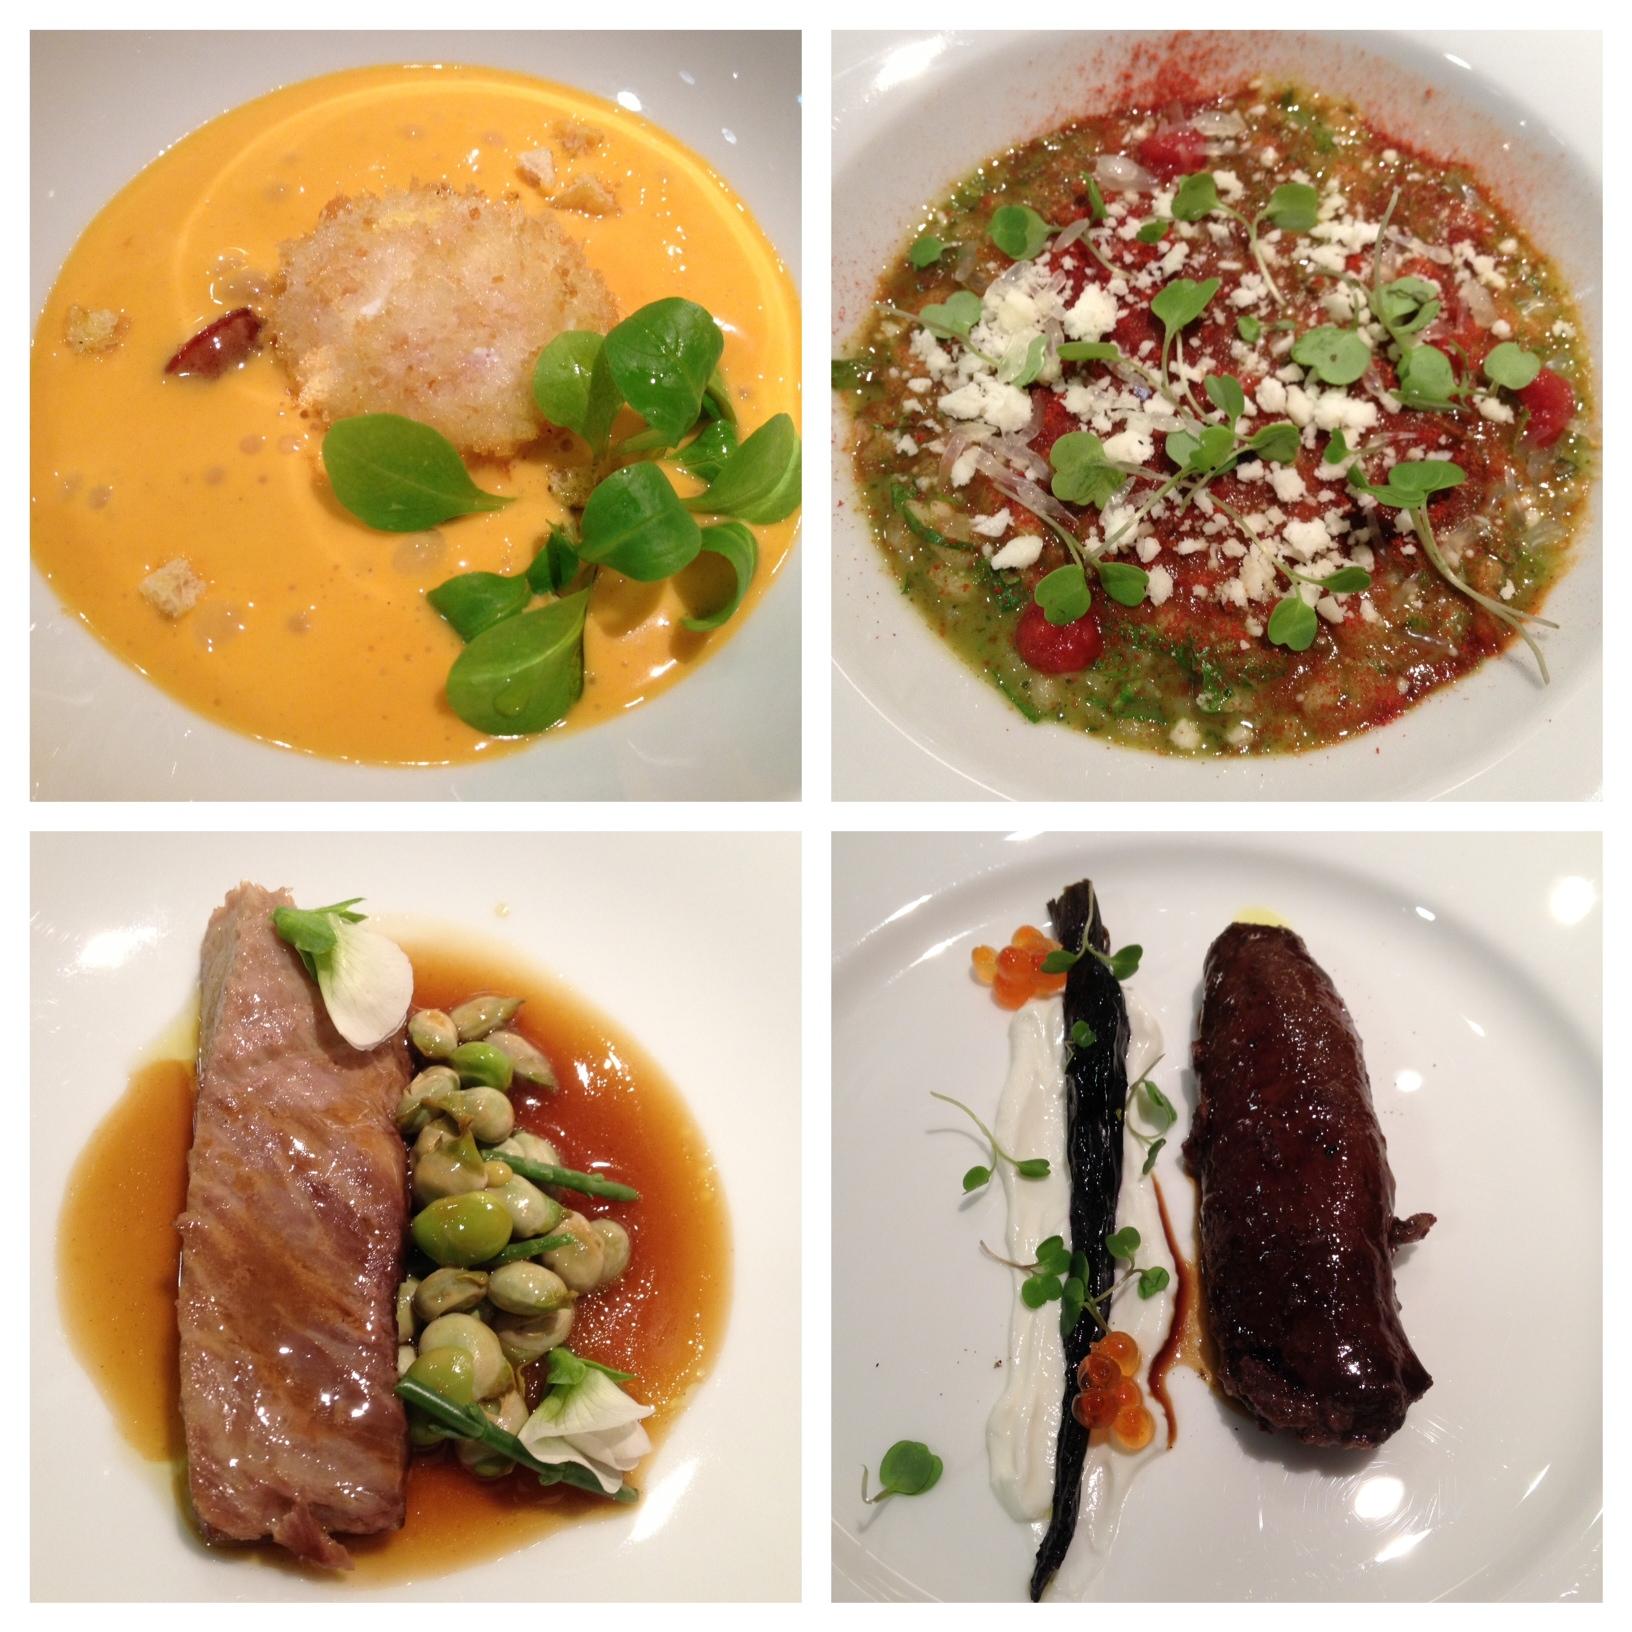 Ricard Camarena en Valencia 1) Huevo frito 2) Arroz margherita 3) Papatana de atún 4) Lomo de liebre